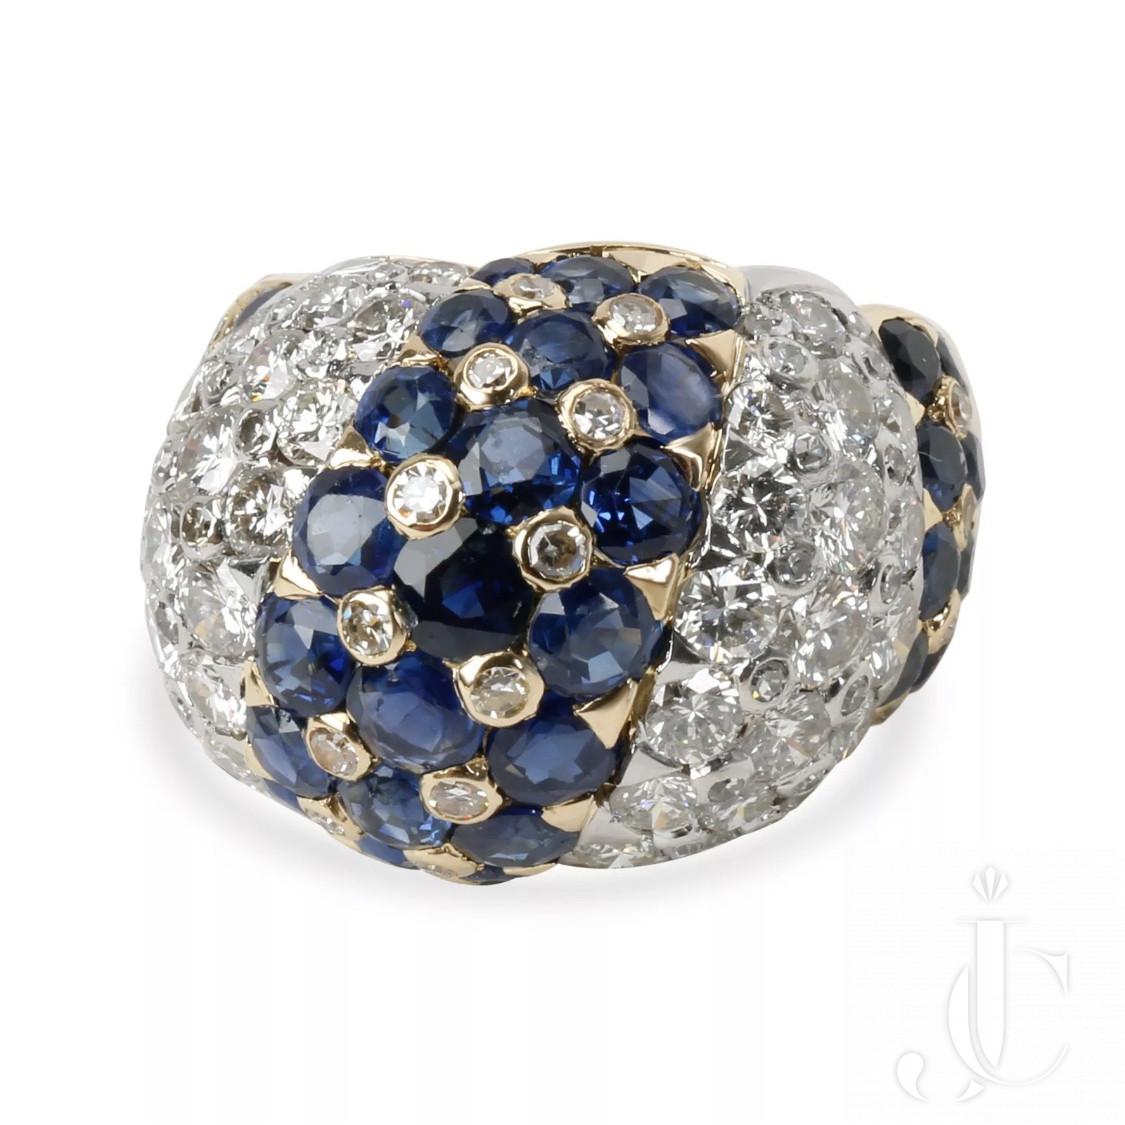 Tiffany cocktail ring